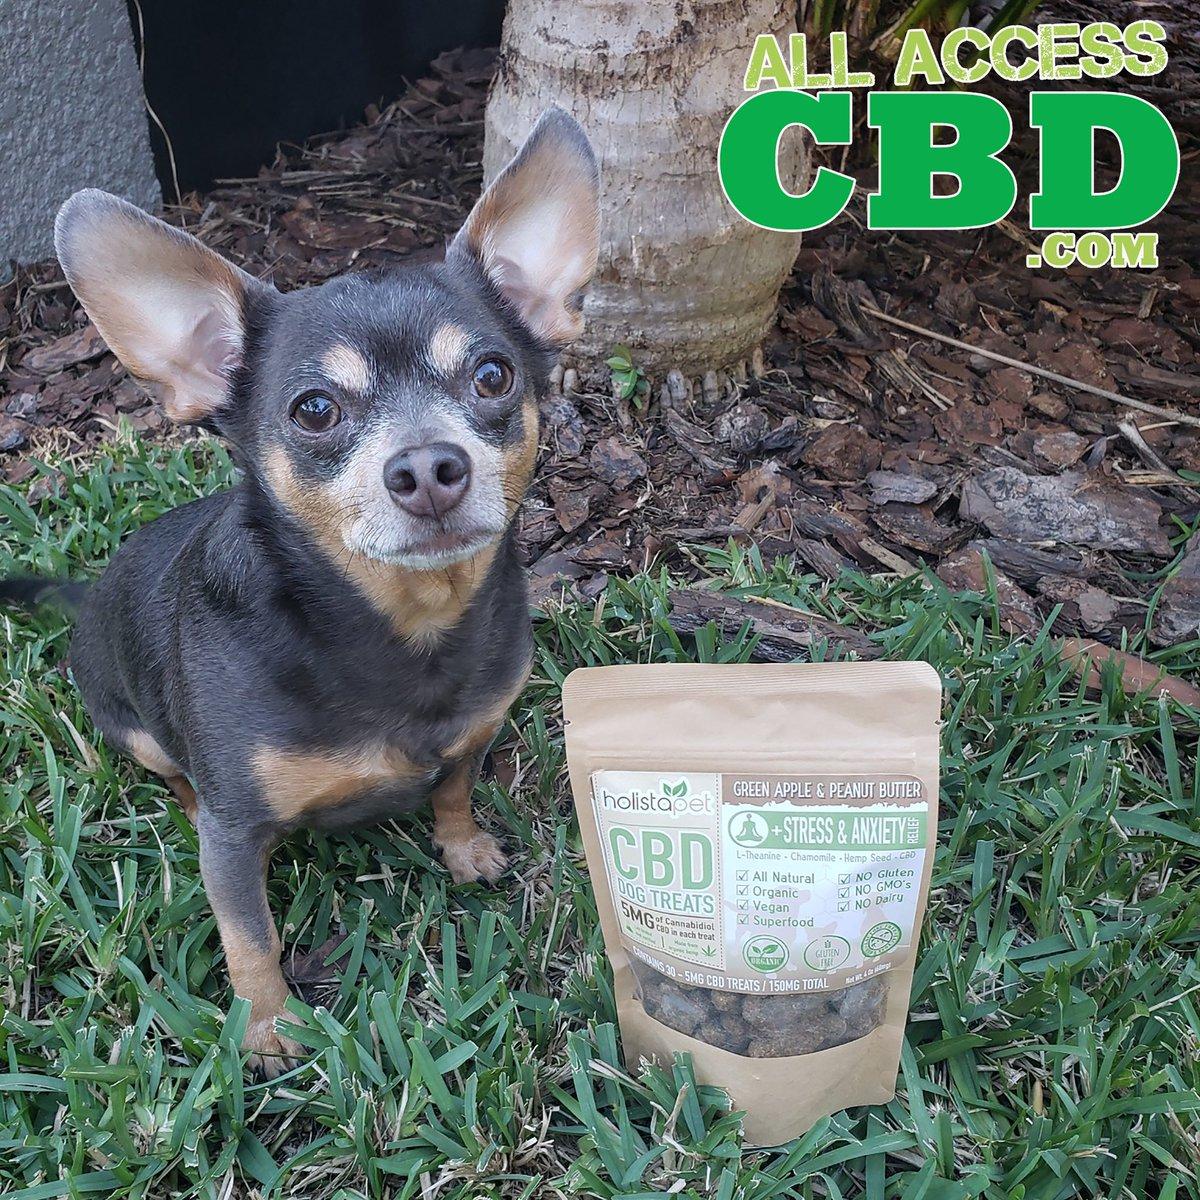 A happy dog is a dog with CBD. #clearwater  #cbd  #cannabis  #cbdoil  #hemp  #cannabiscommunity  #cbdlife  #hempoil  #tampa  #allaccess  #allaccesscbd  #cbdshop  #edibles  #cbdshop  #palmharbor  #lutz  #FullSpectrum  #Isolate